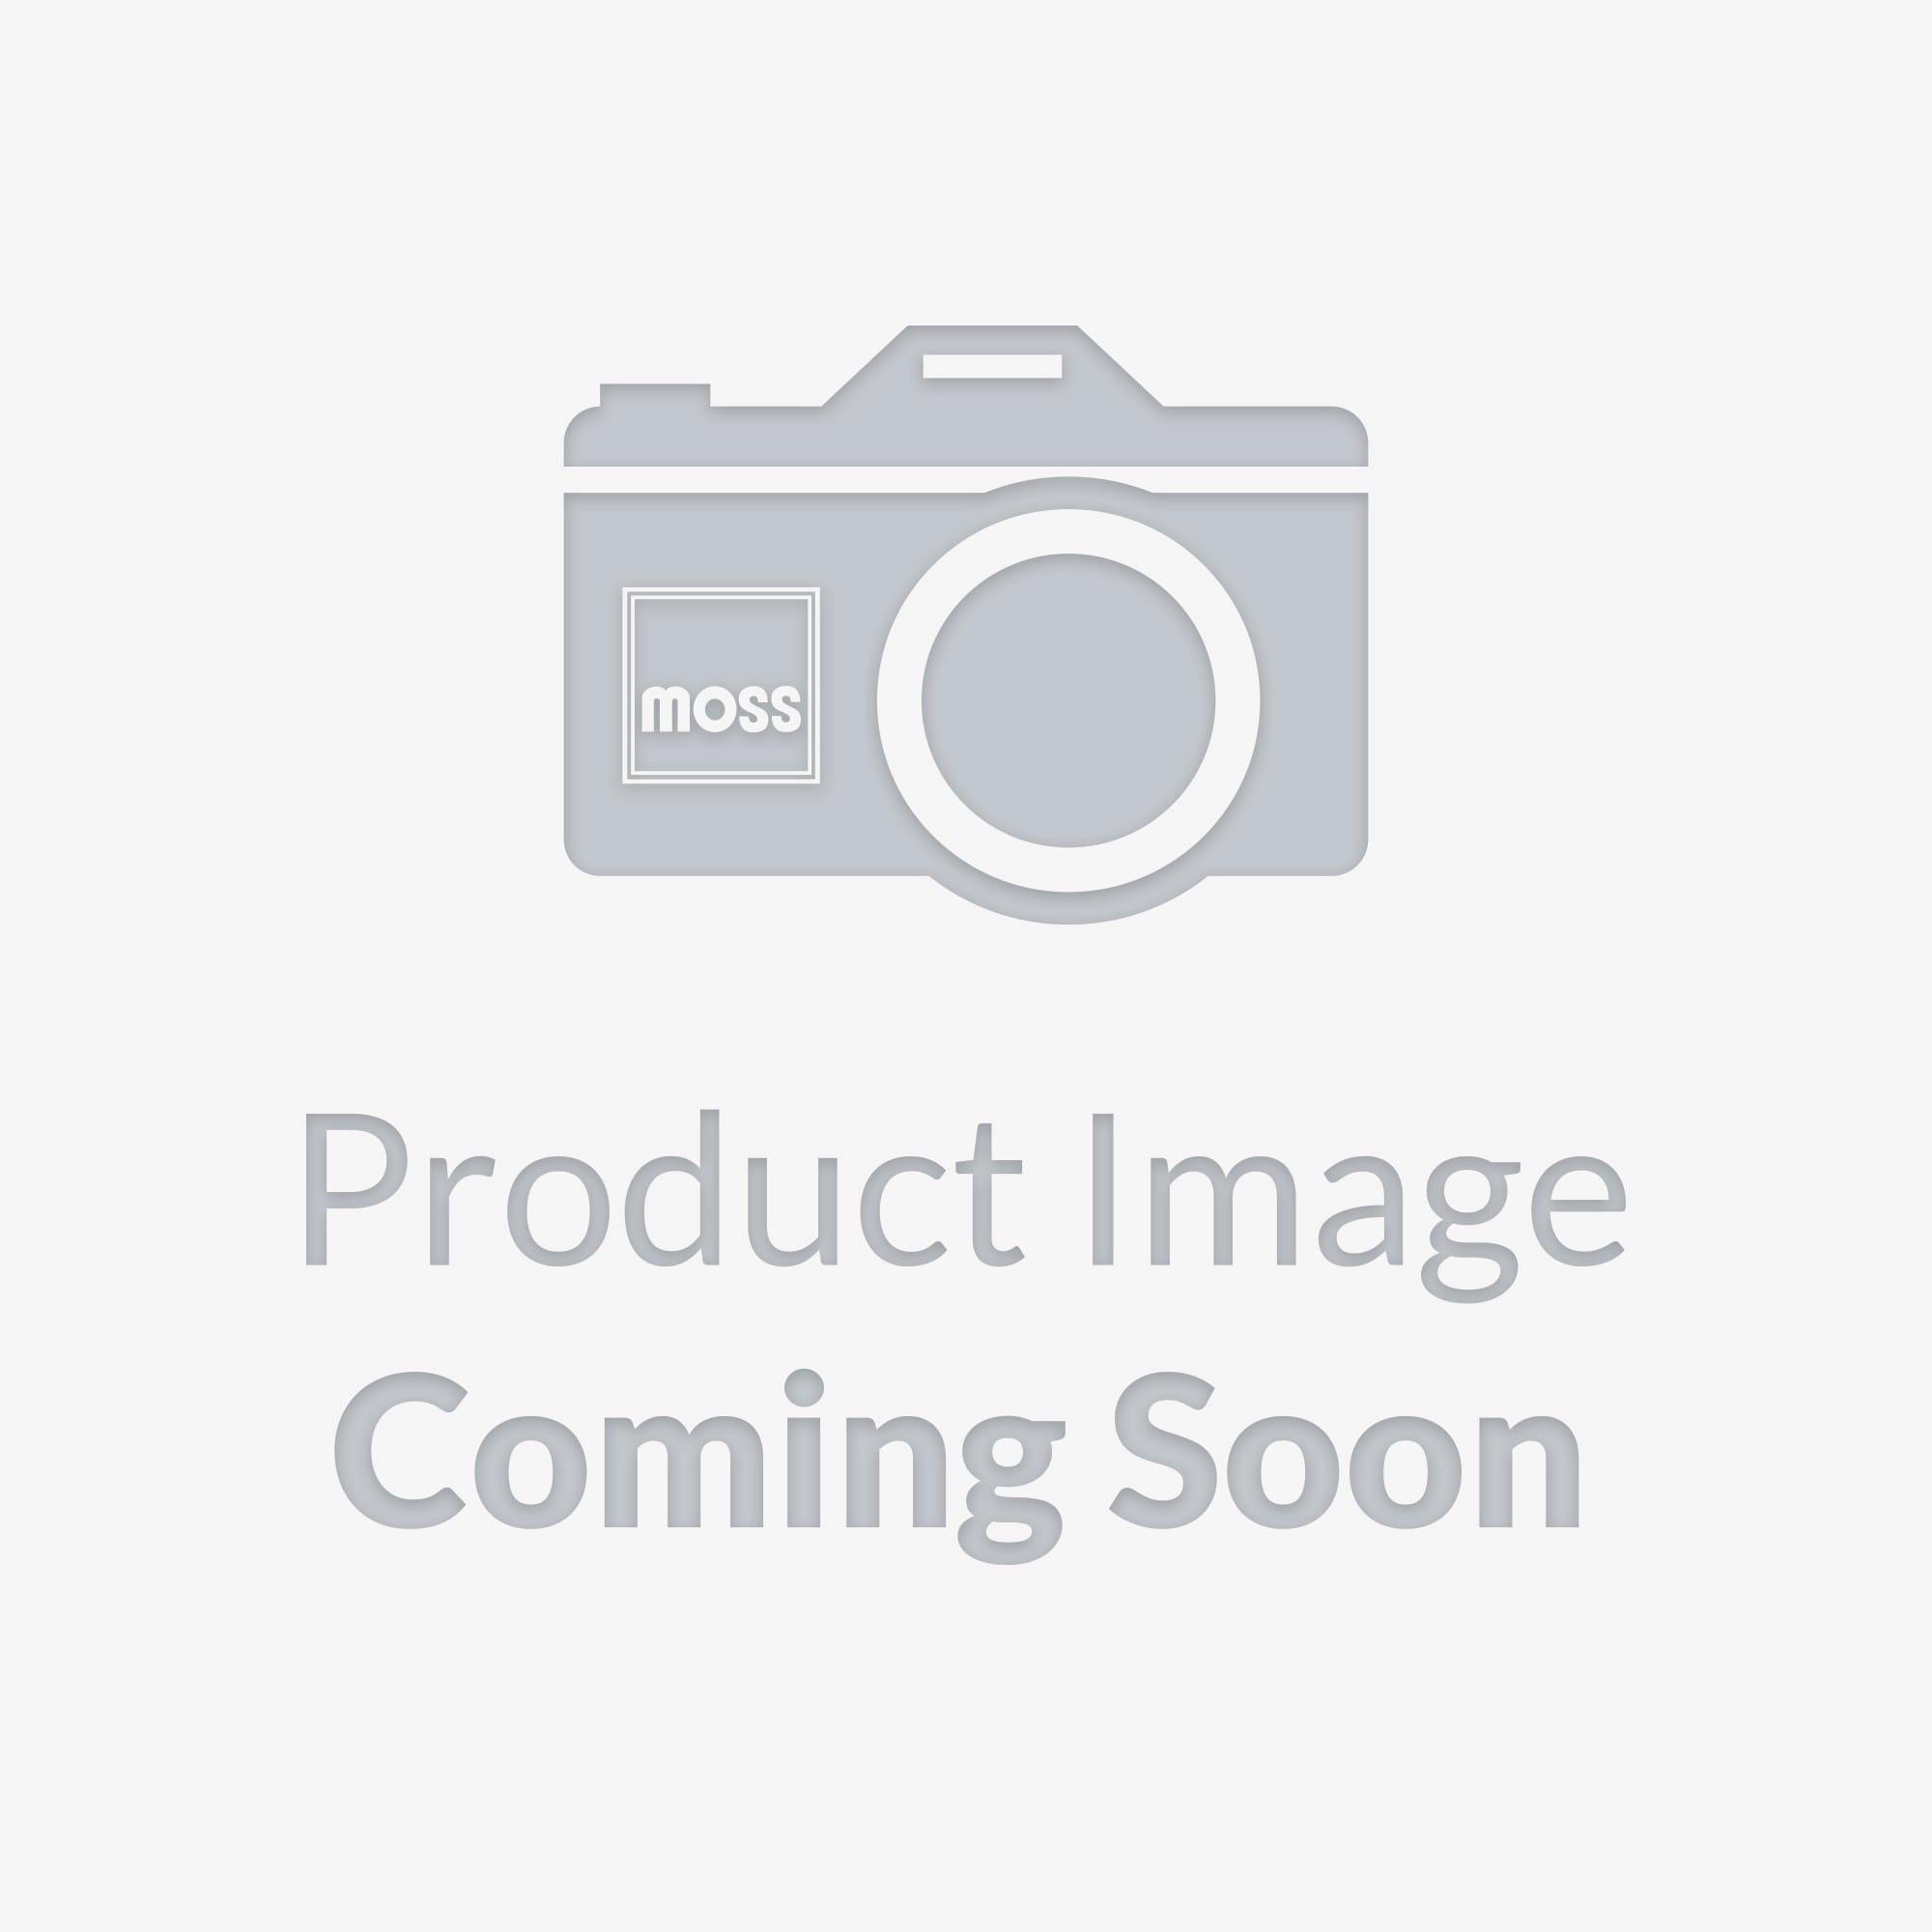 900 310 detachable bike rack mossmiata